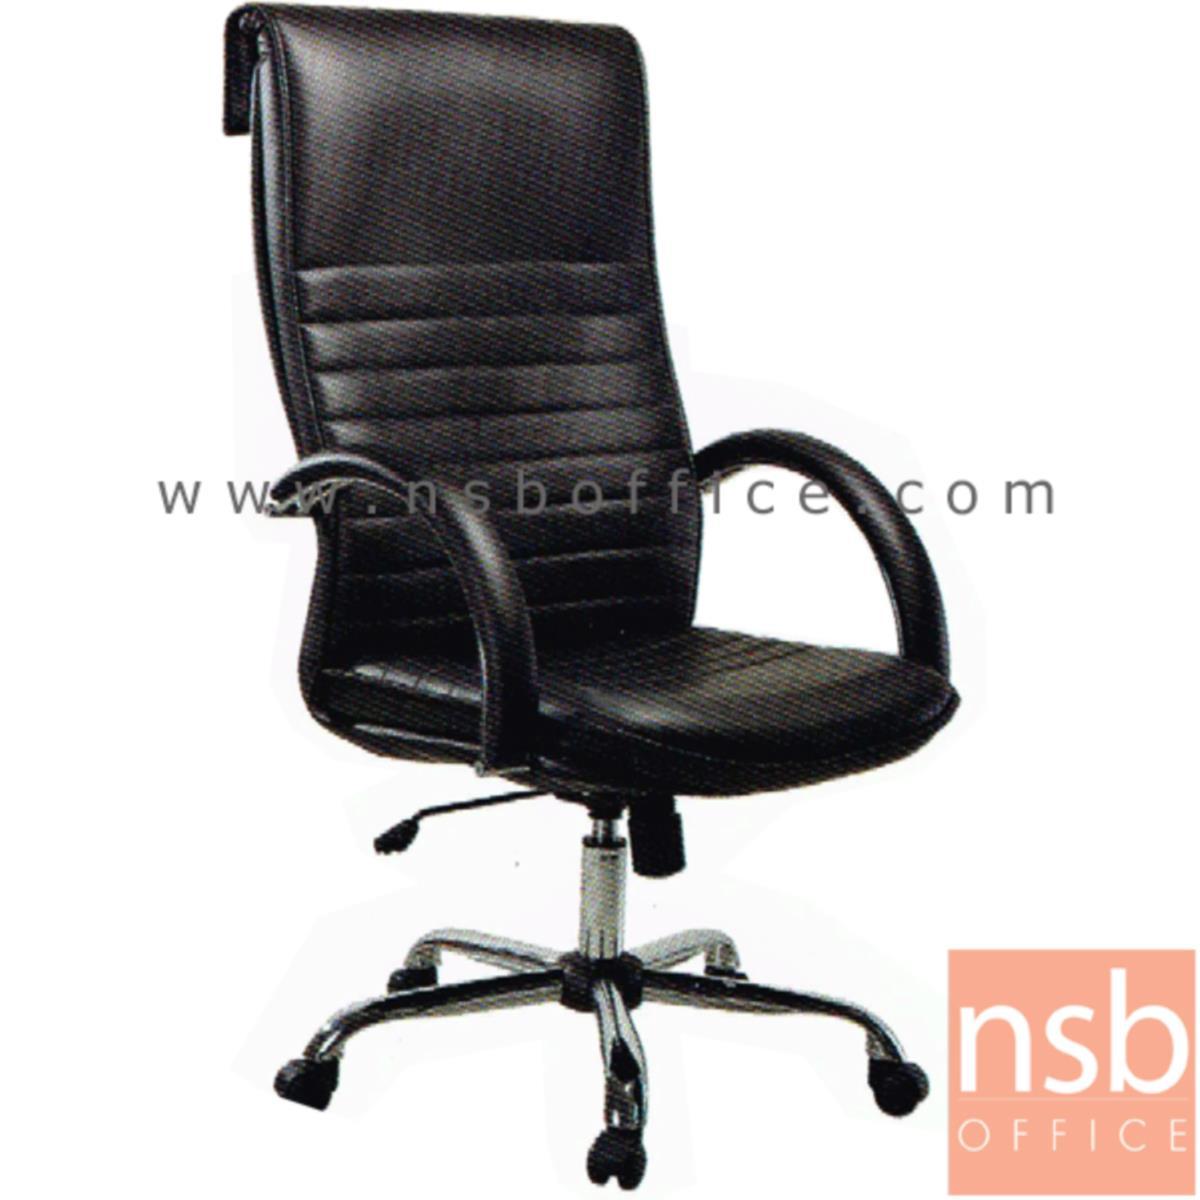 B01A411:เก้าอี้ผู้บริหารพนักพิงสูง หลังพับ  รุ่น Treadaway (ทรีดาเวย์)  ขาเหล็กชุบโครเมี่ยม โช๊คแก๊ส ก้อนโยก